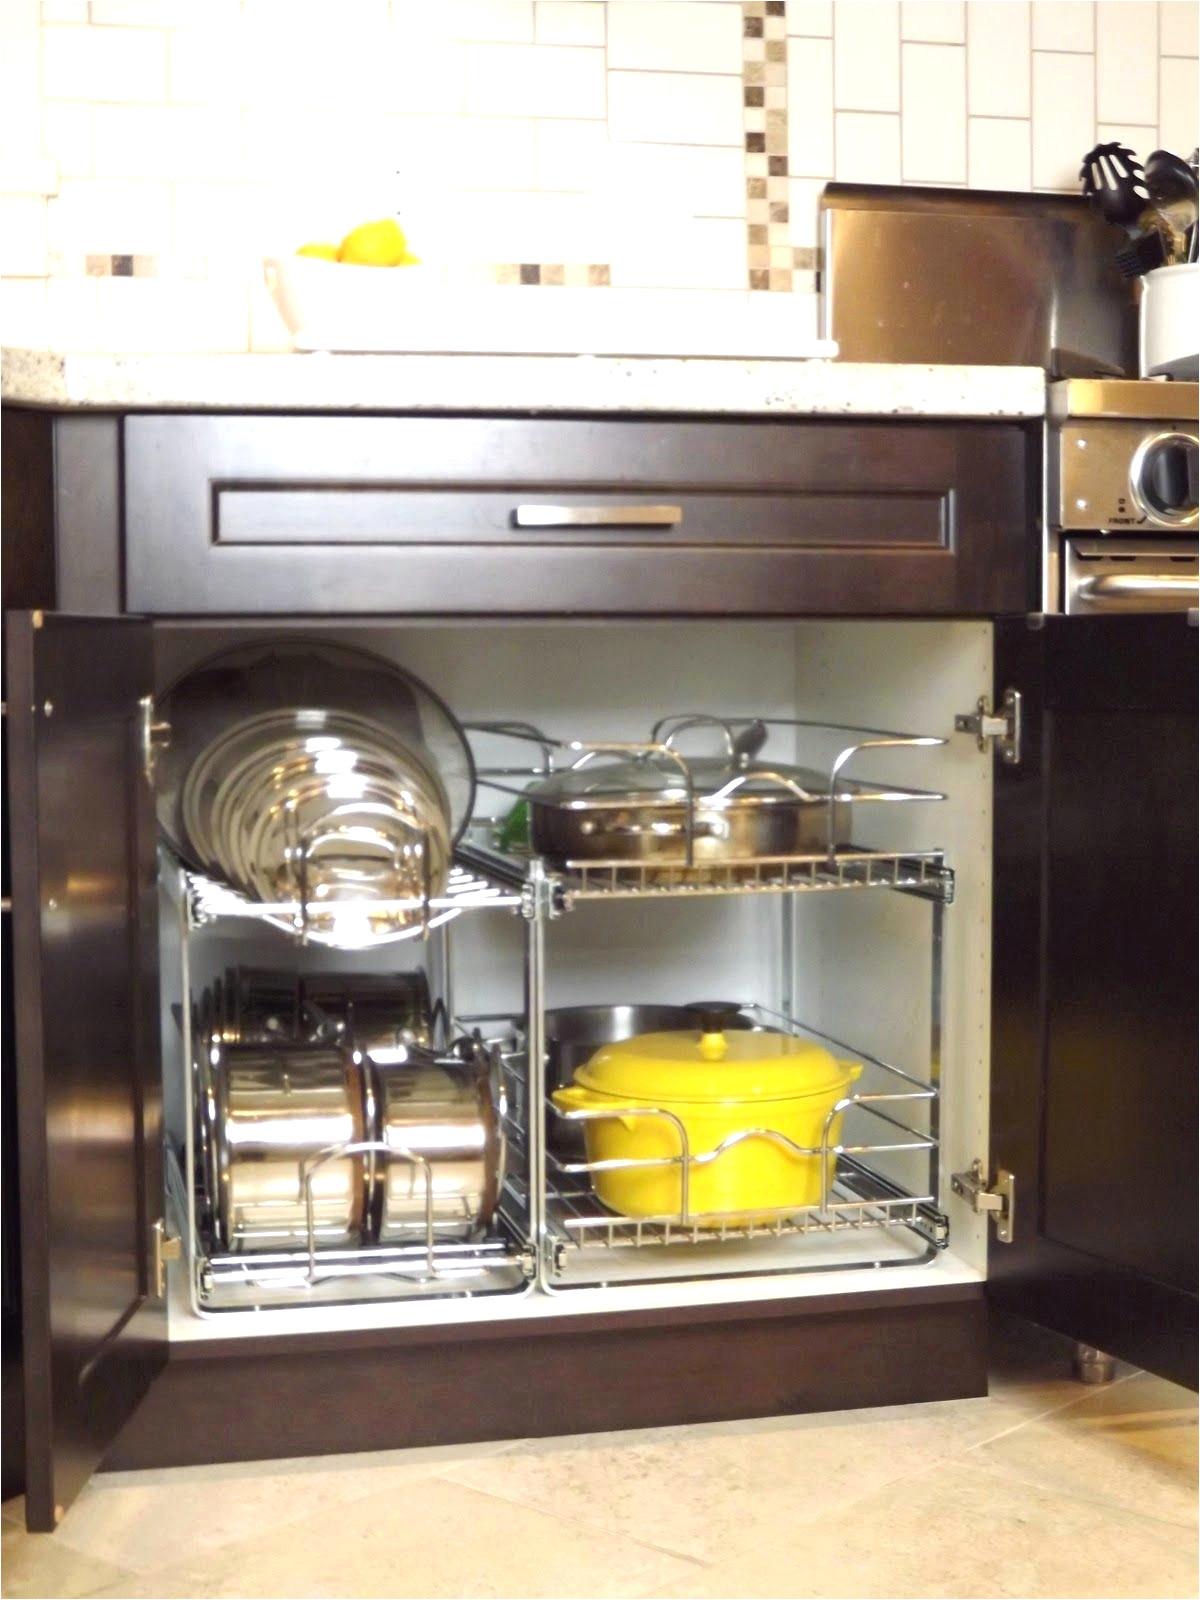 granite countertops syracuse ny new kitchen cabinets syracuse ny awesome star kitchen cabinets new 17